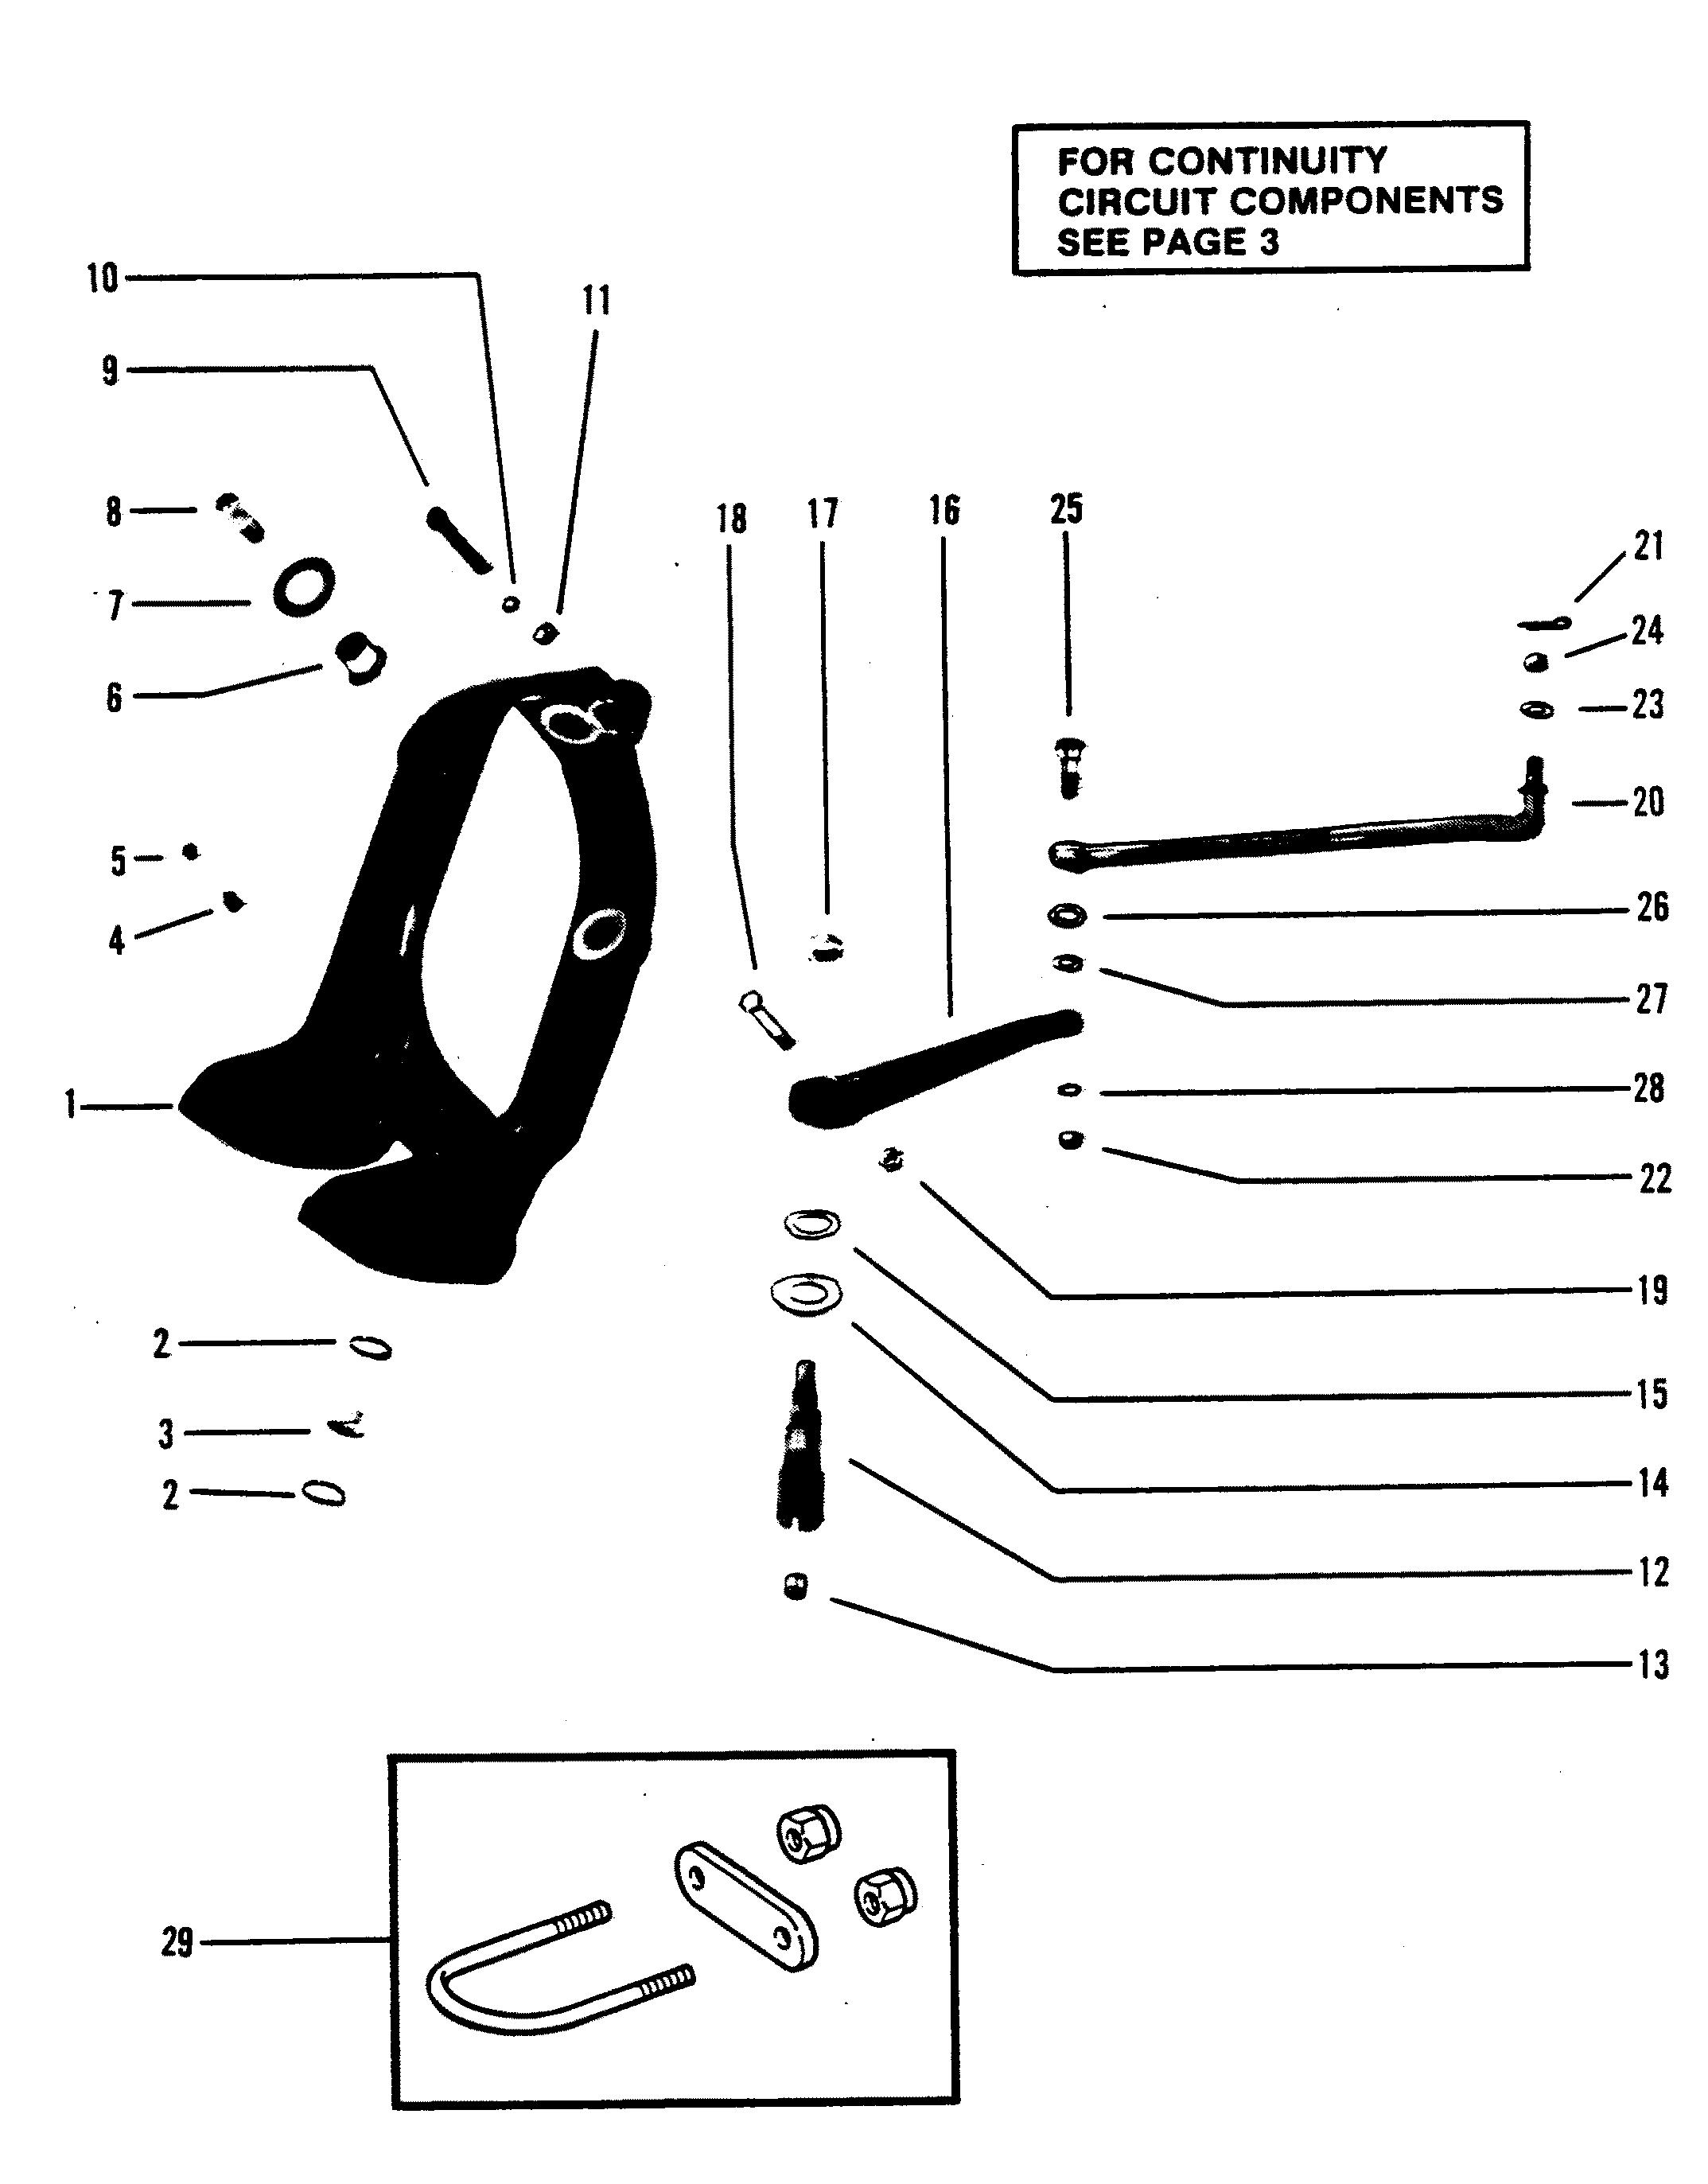 5 baja designs wiring diagram periodic tables baja designs wiring diagram at bakdesigns.co